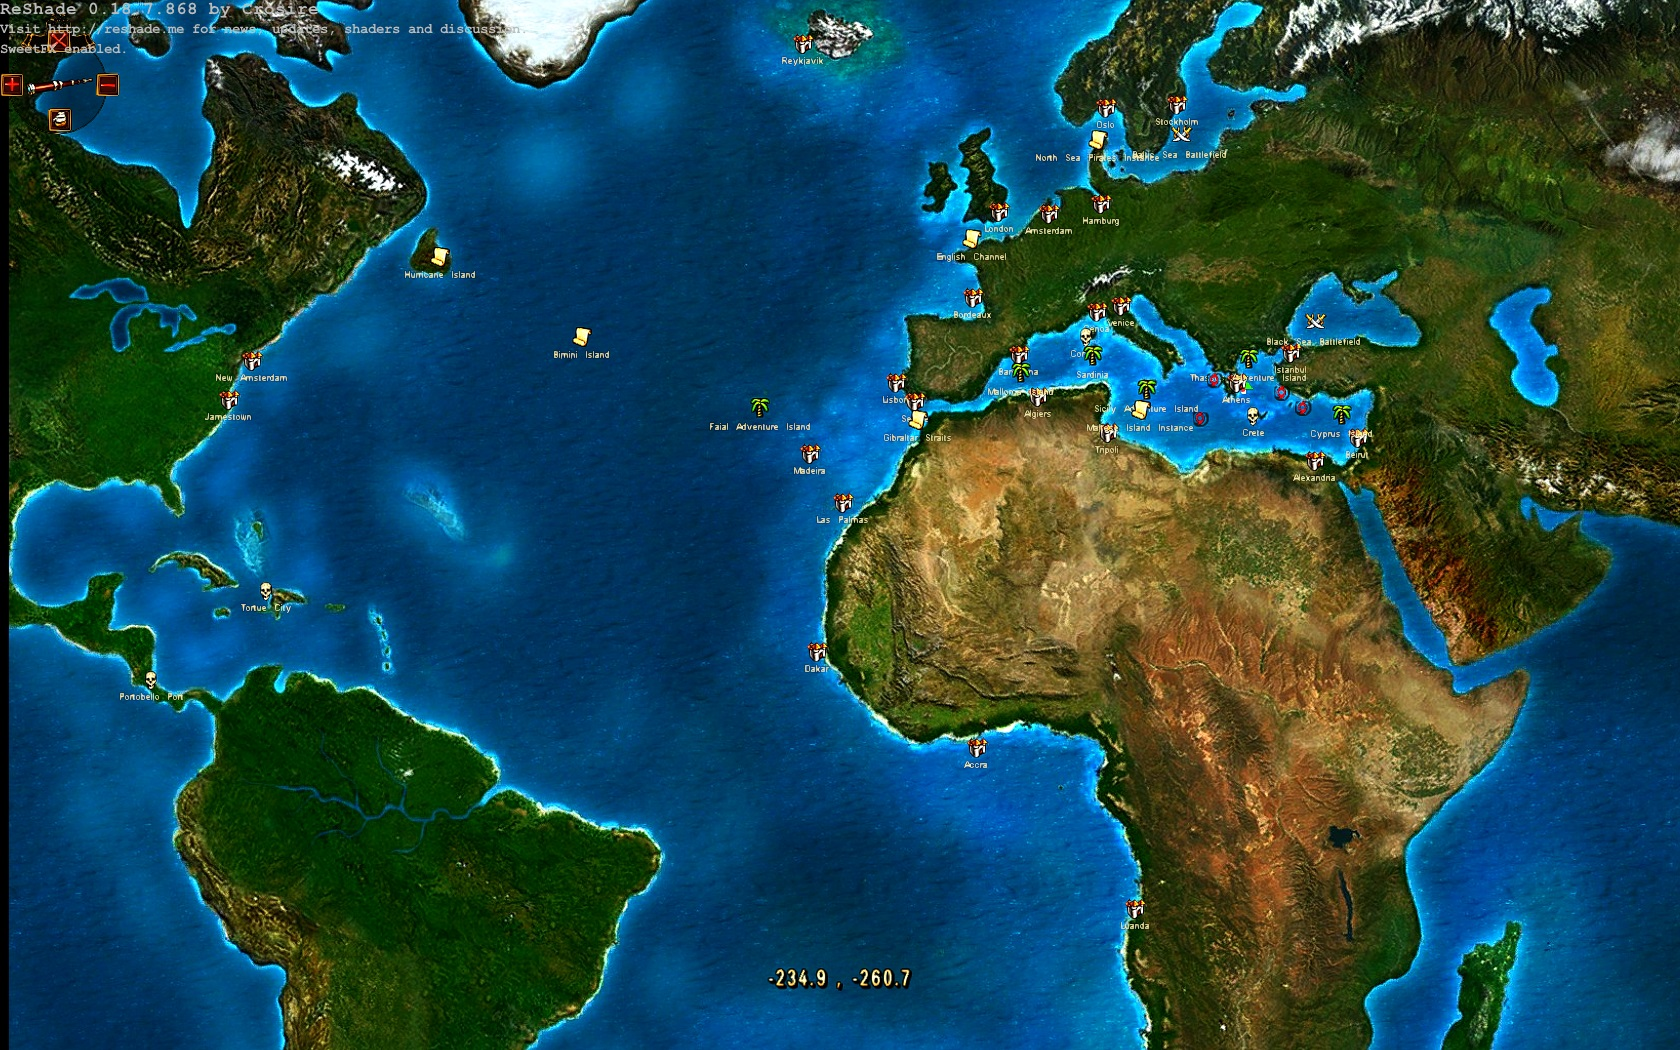 Voyage century online world map image mod db world map view original gumiabroncs Choice Image